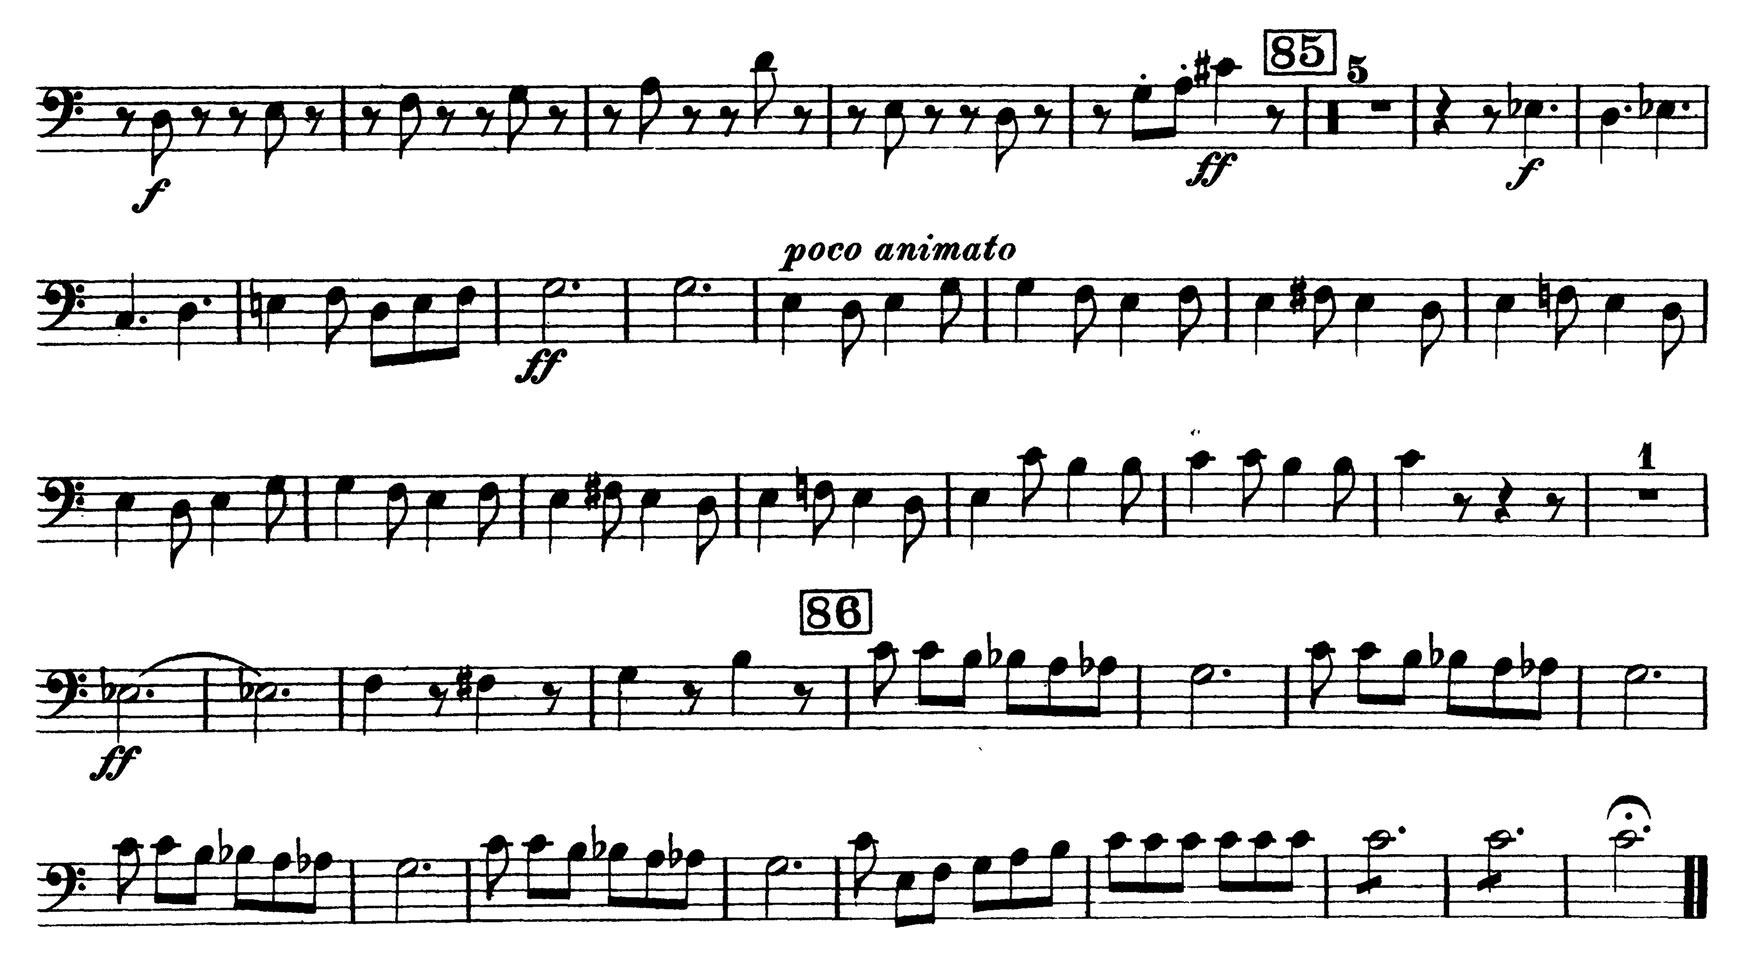 symphony fantastique Excerpt 1 - movement iv: to , excerpt 2a - movement v: to 2 measures before , excerpt 2b - movement v: 11 measures before to.